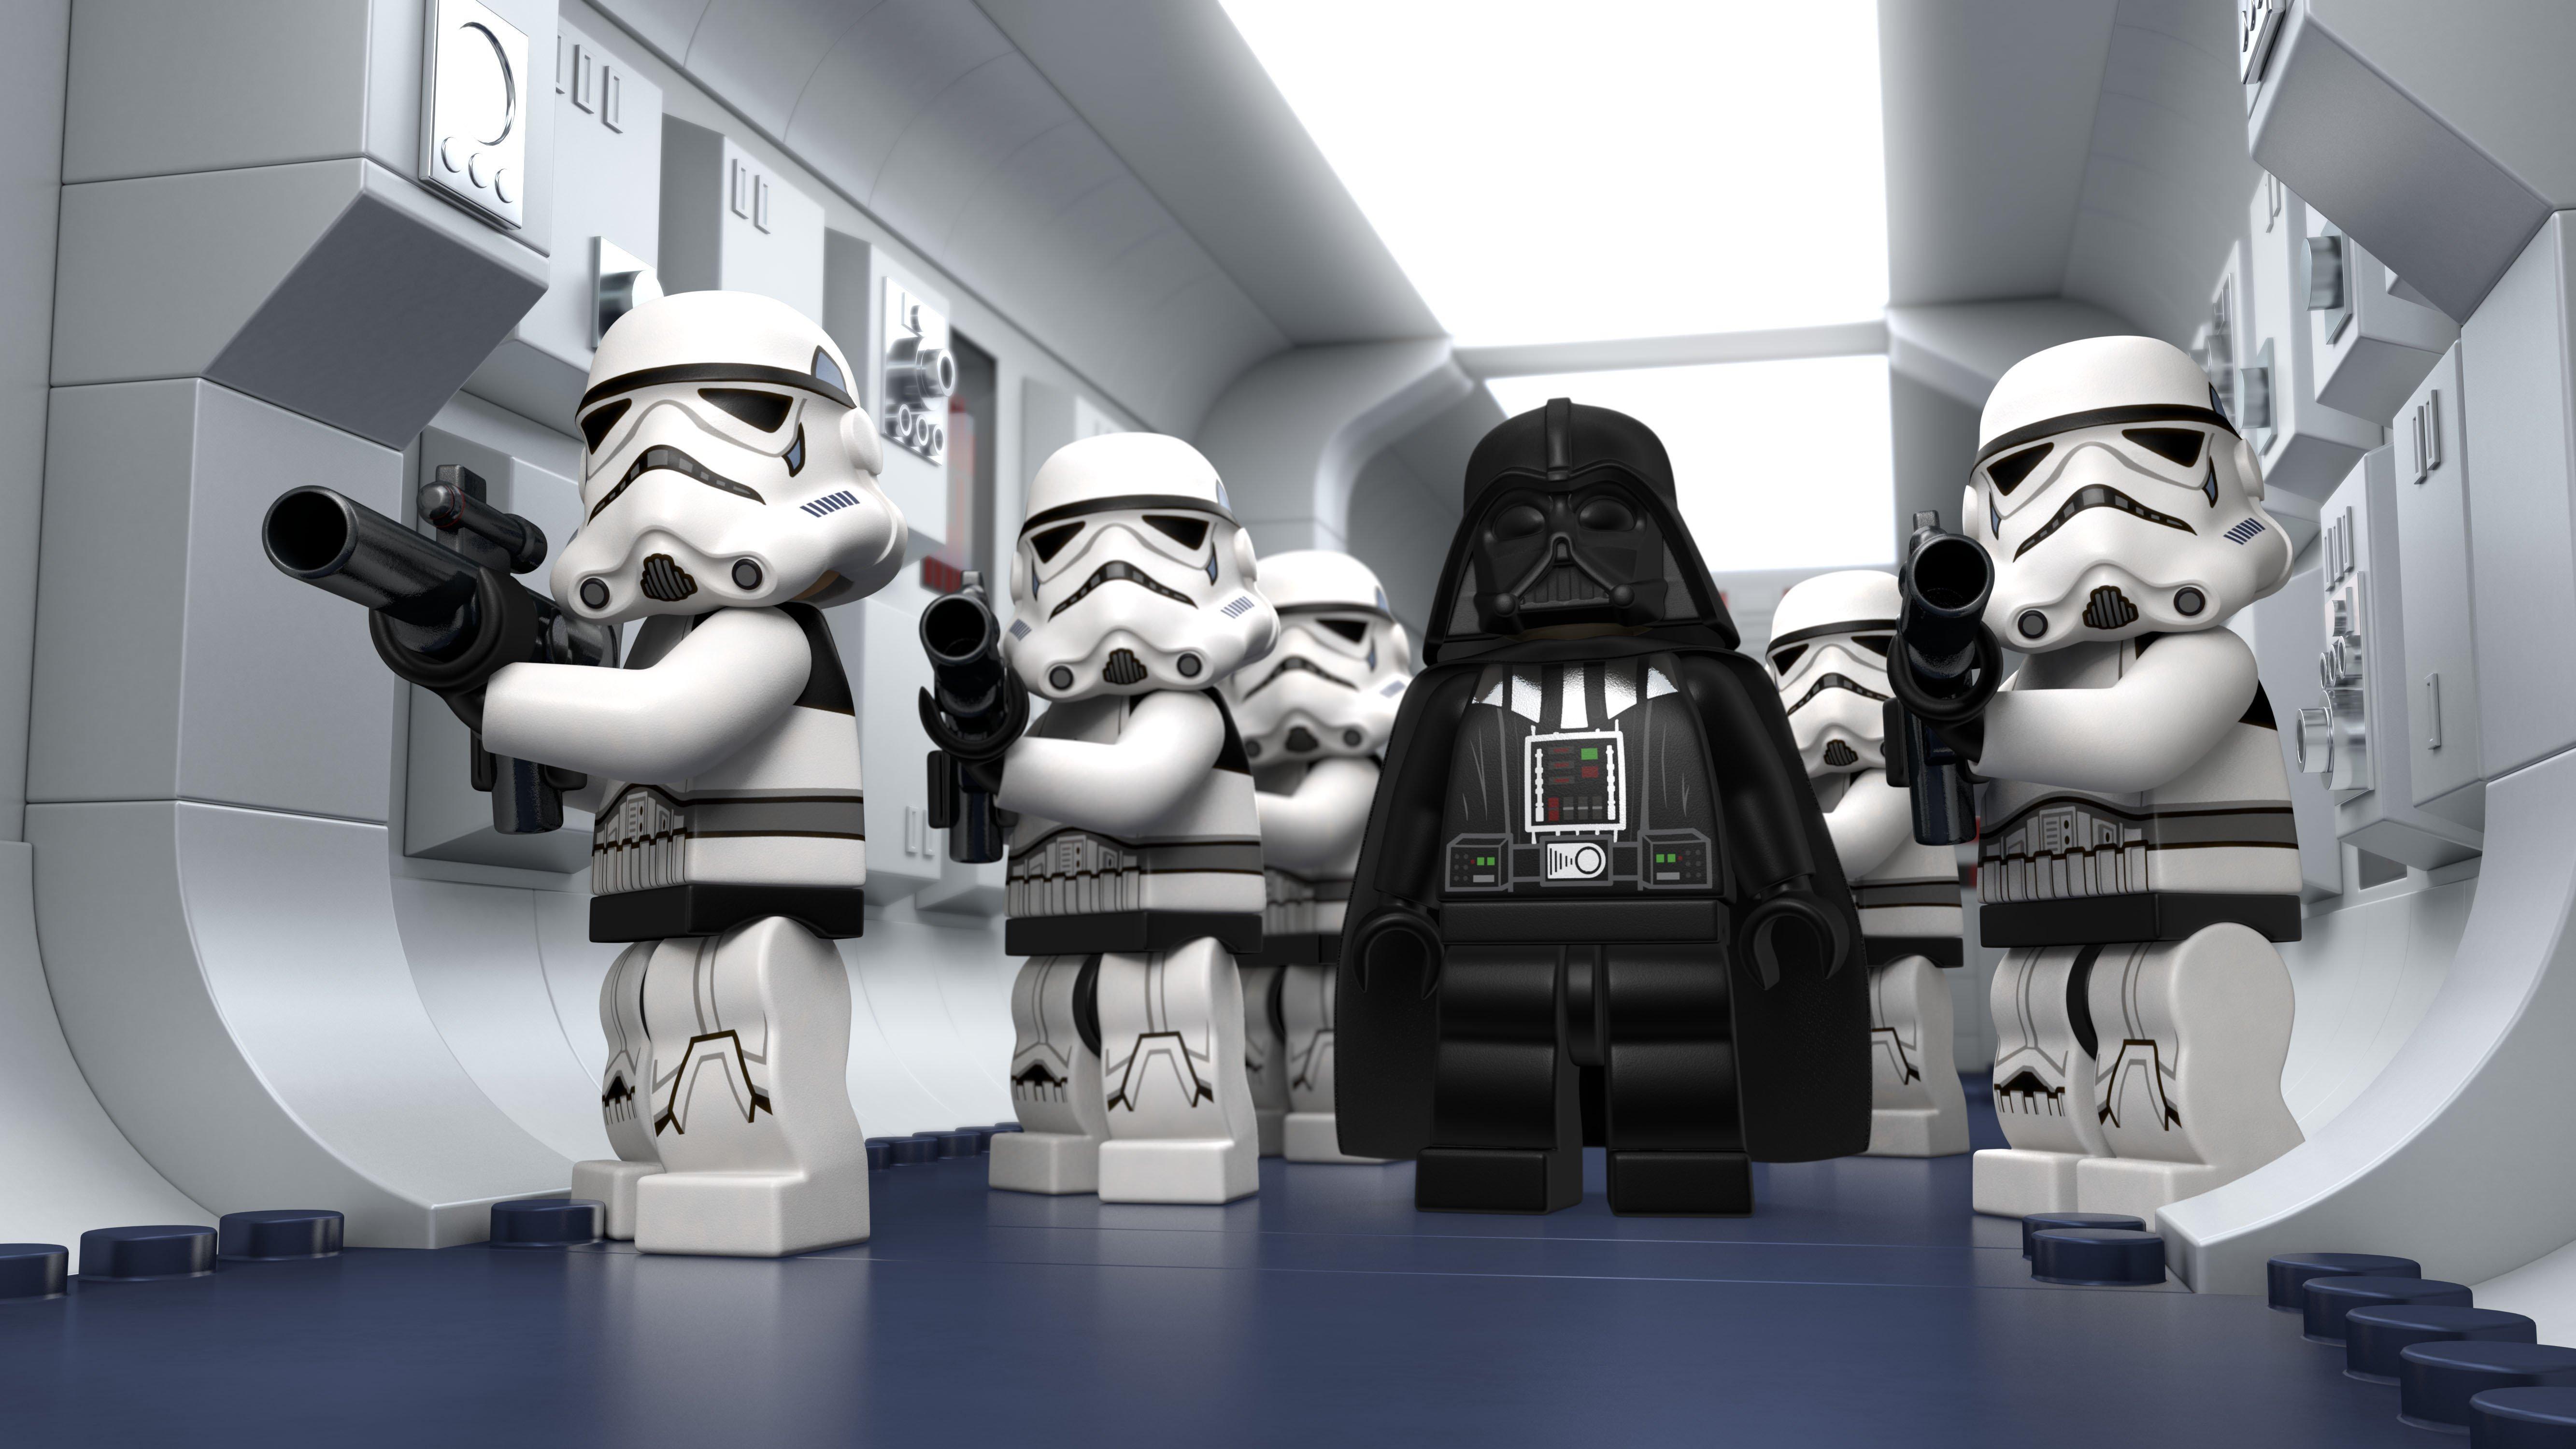 lego star wars droid tales stormtrooper, hd movies, 4k wallpapers